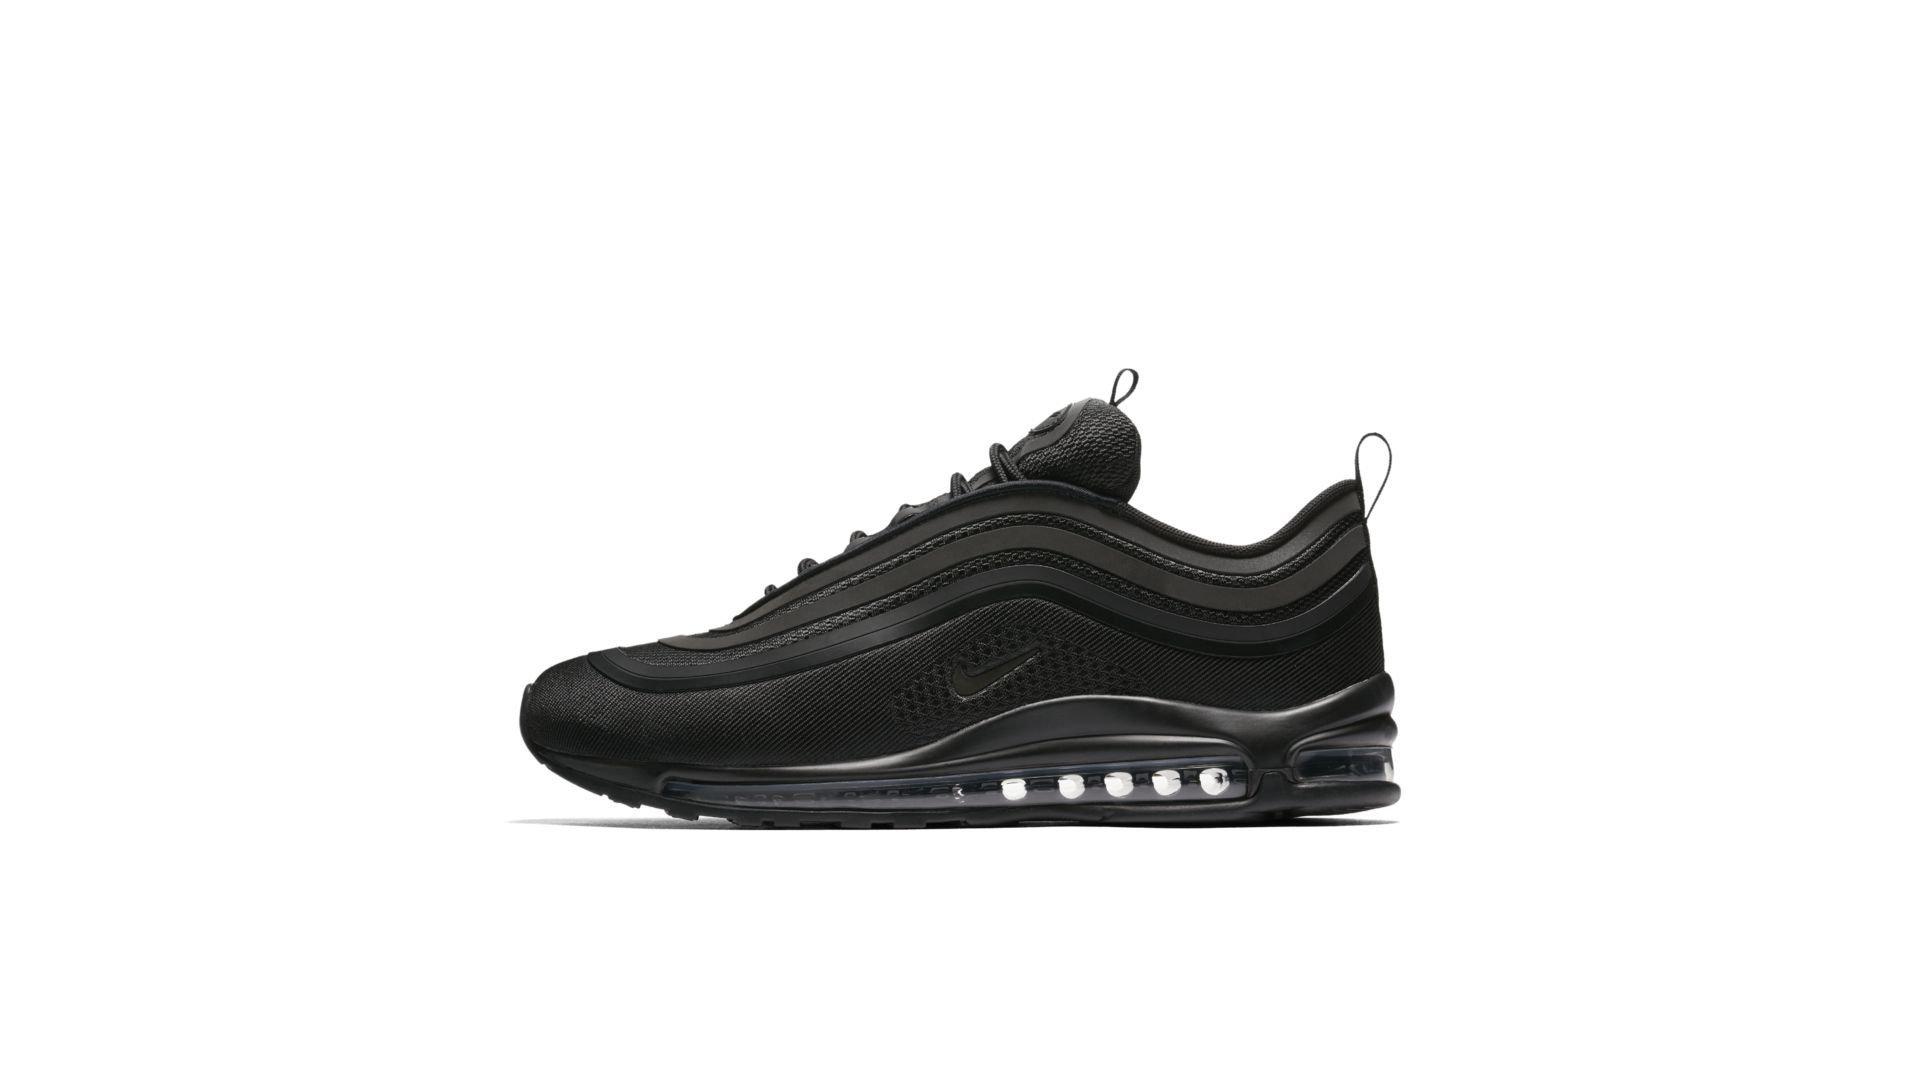 Nike Air Max 97 Ultra 17 Triple Black (918356-002)